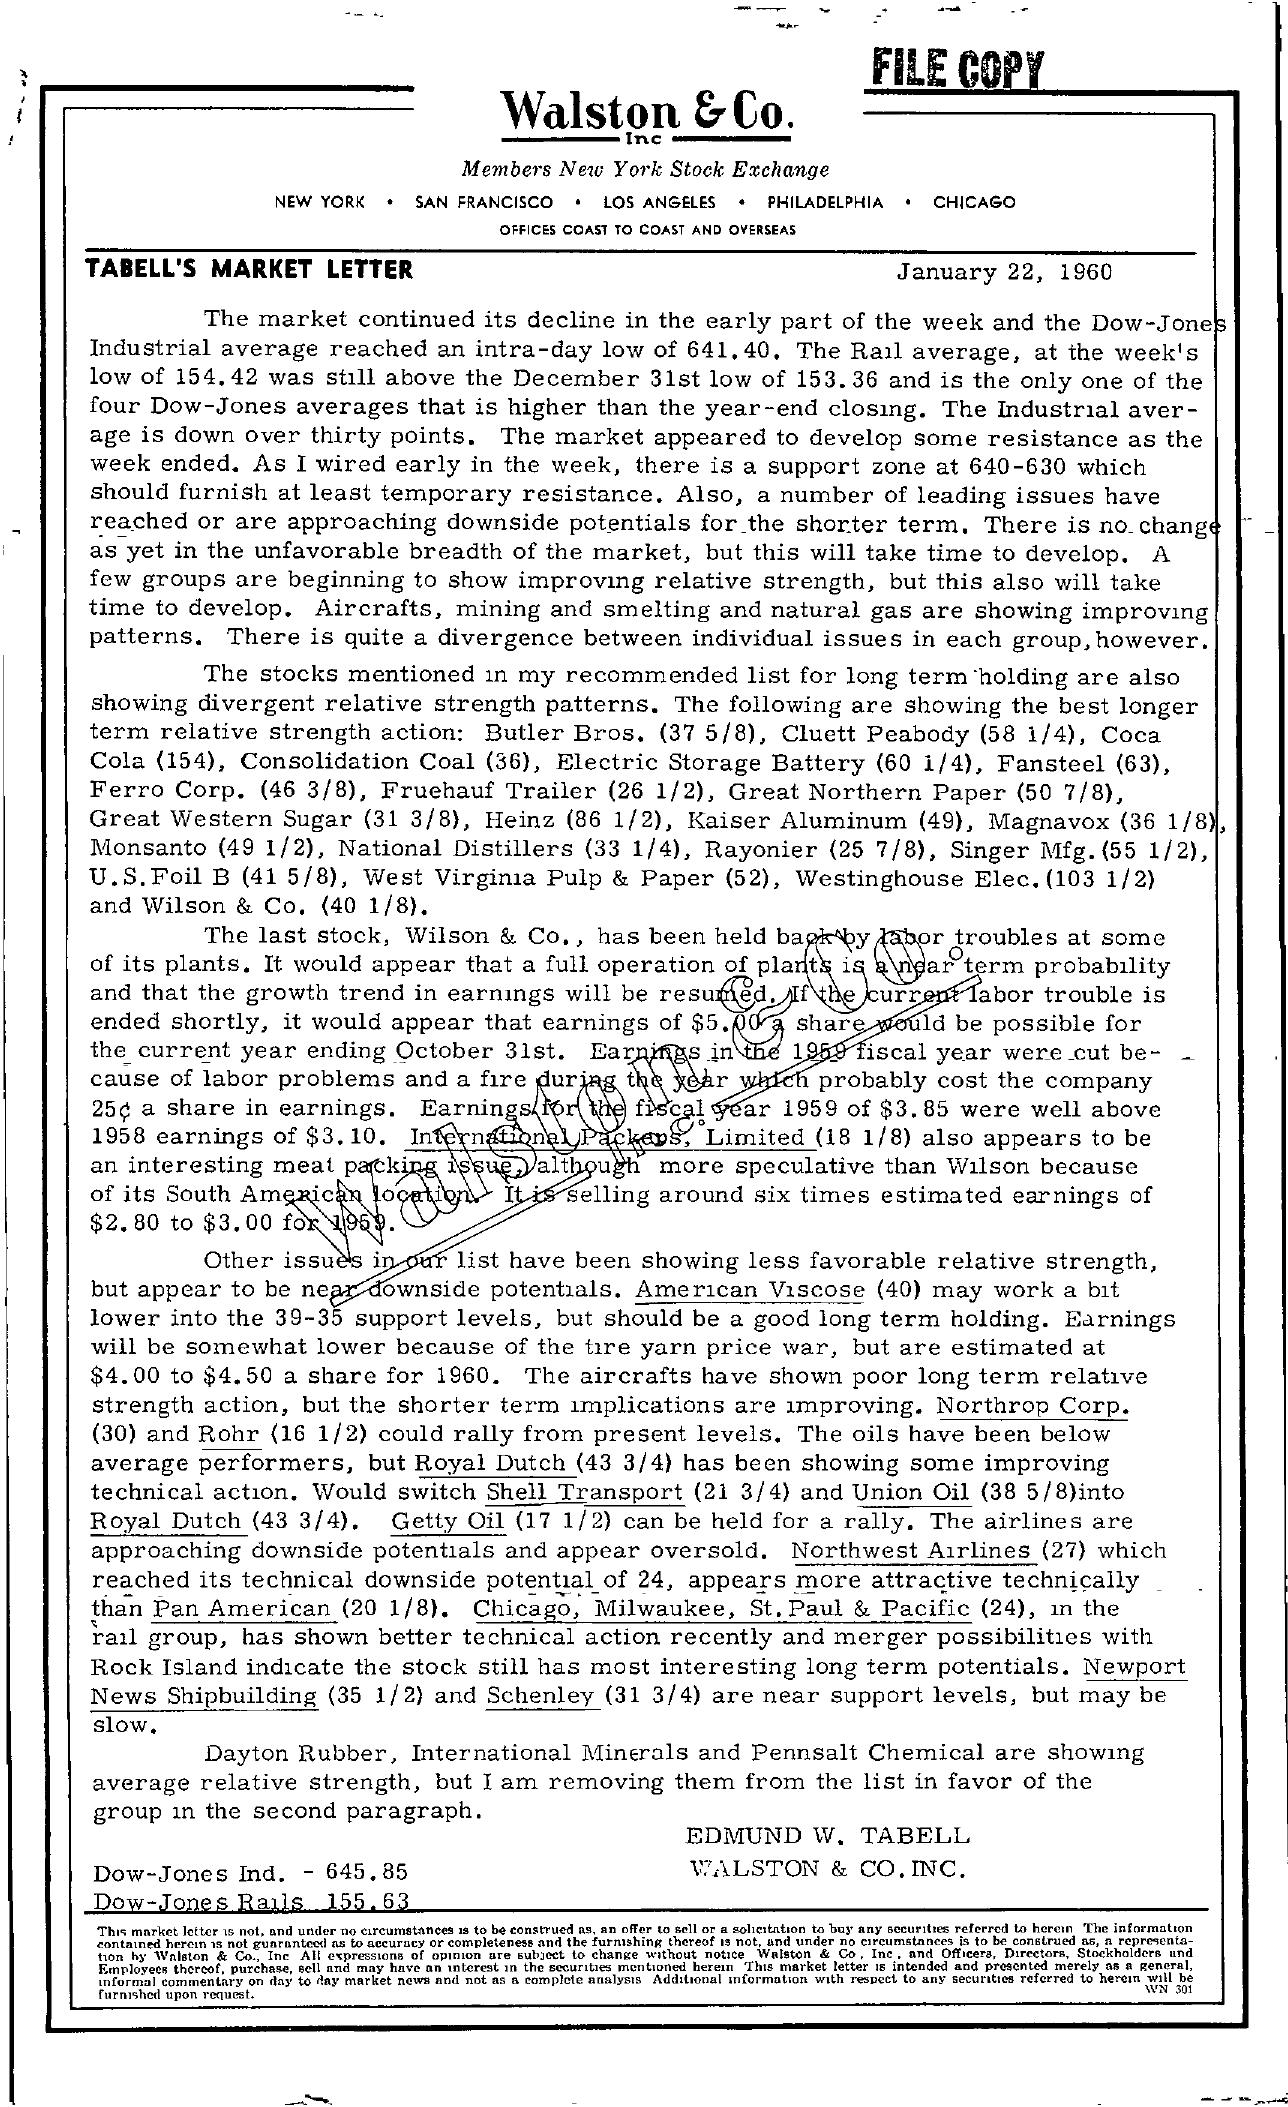 Tabell's Market Letter - January 22, 1960